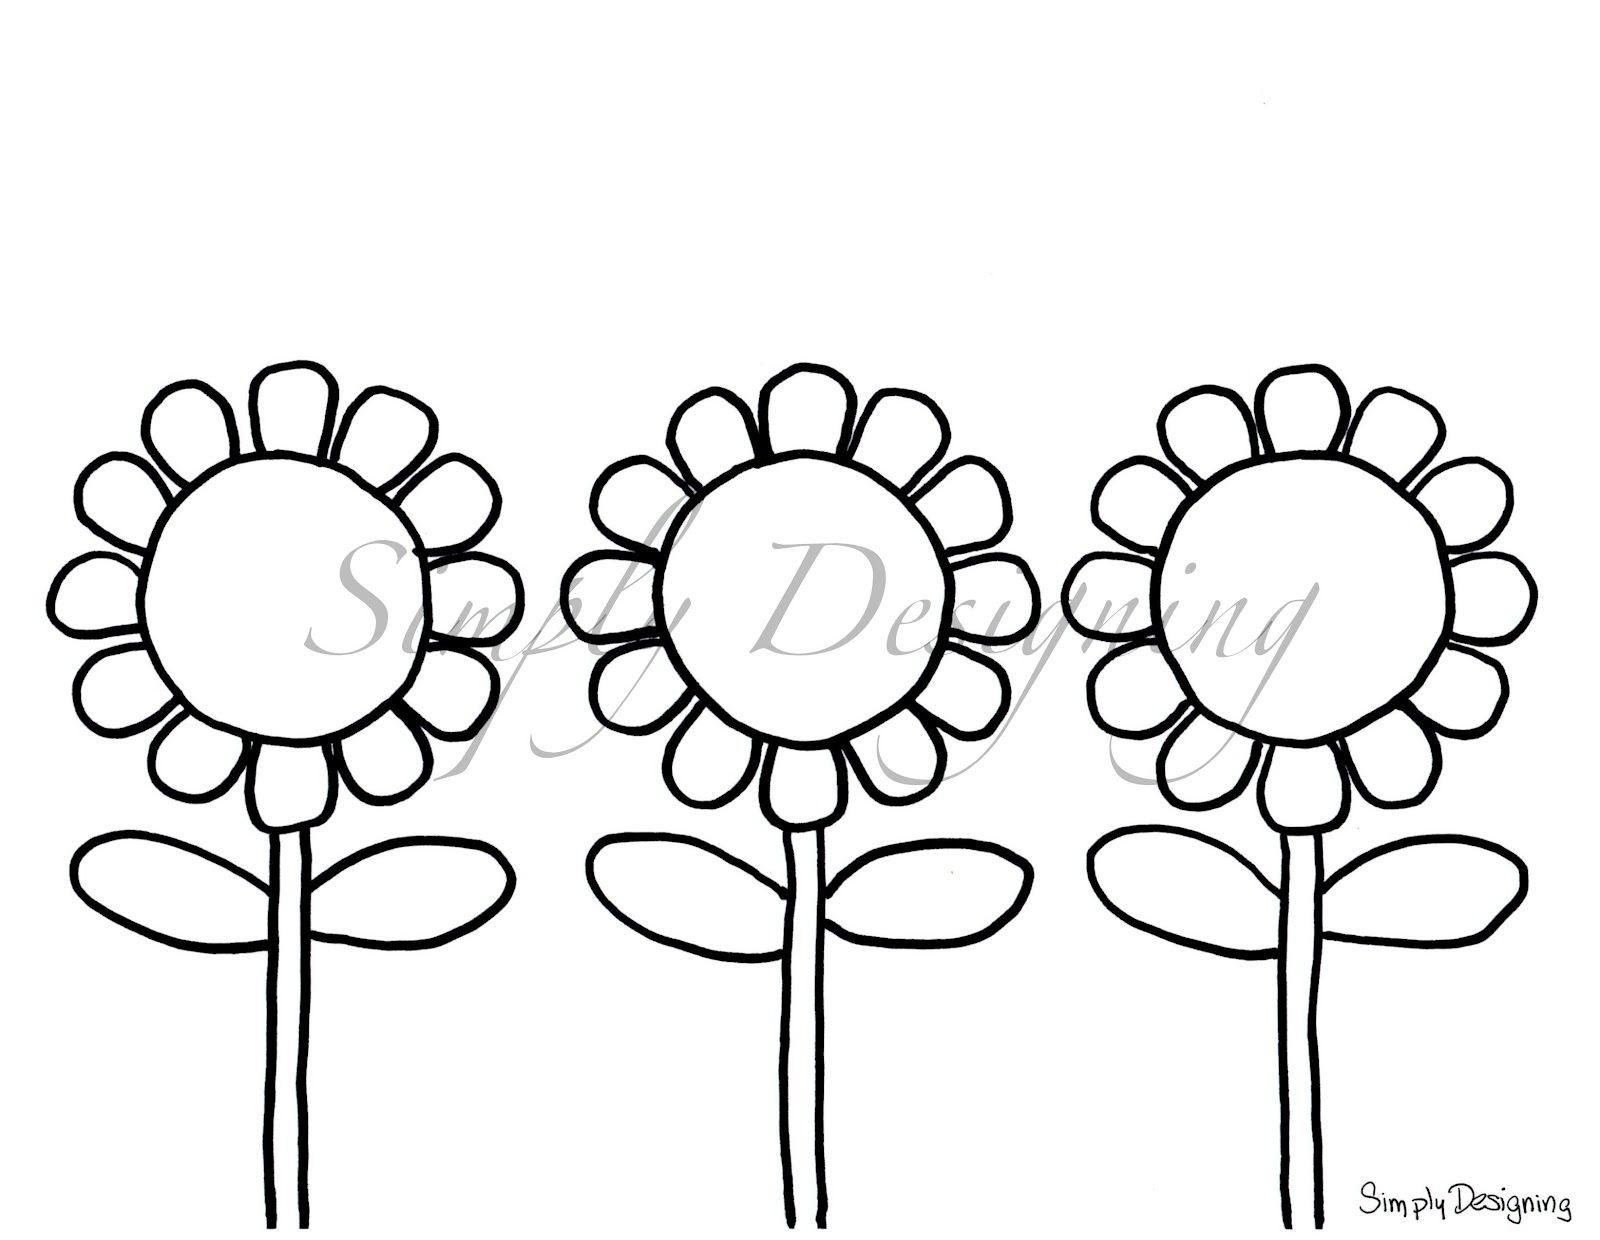 Spelling Word Flowers Free Printable Boredom Buster